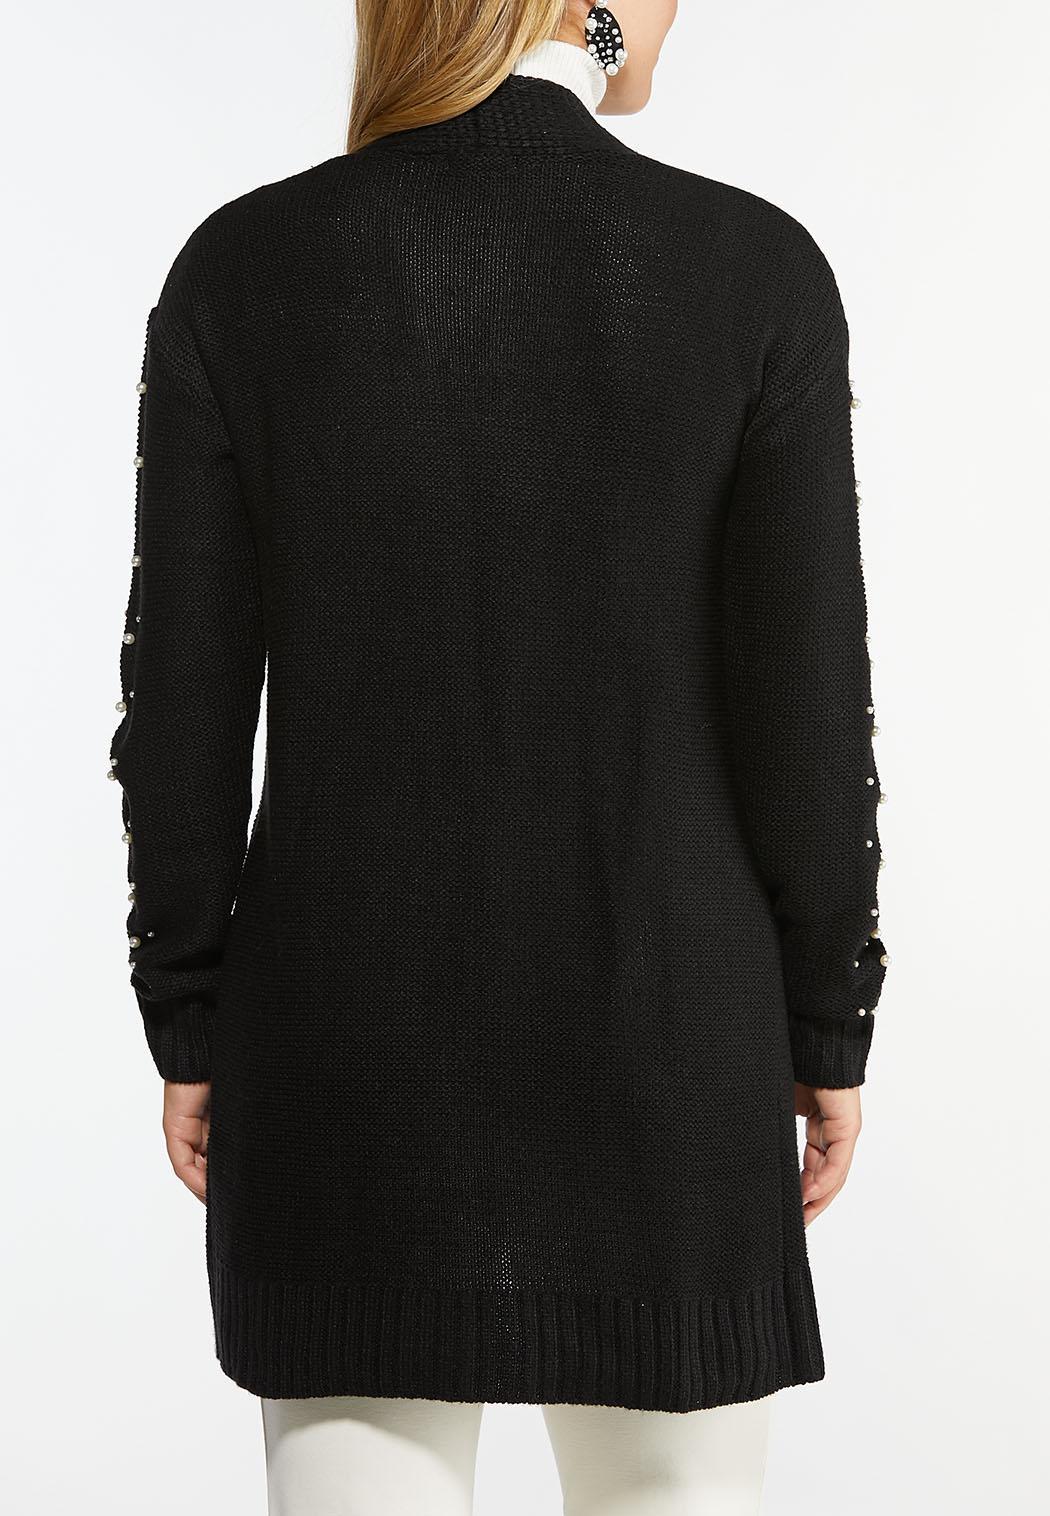 Plus Size Pearl Embellished Cardigan Sweater (Item #44461048)